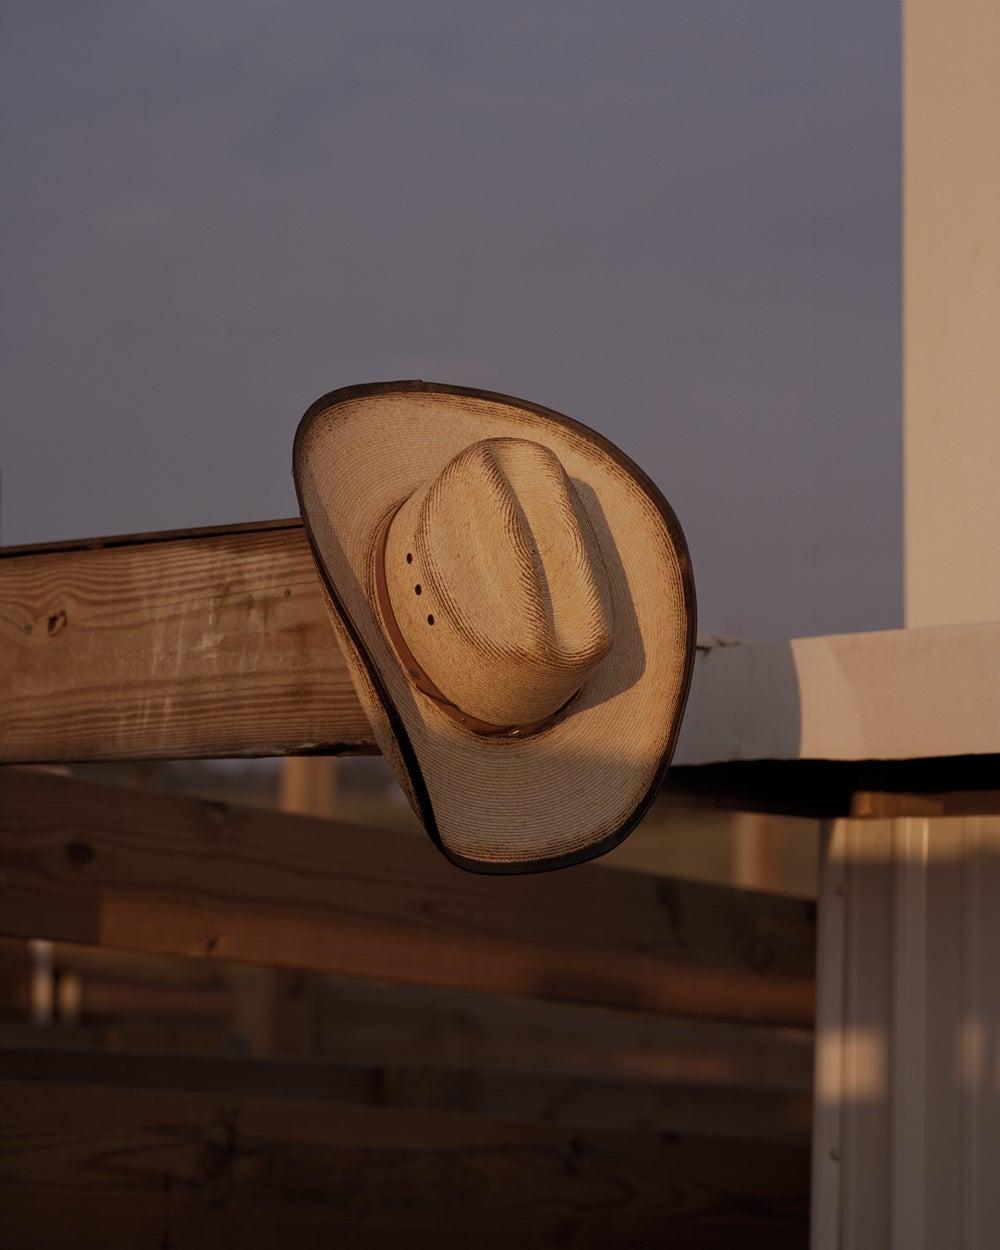 Image of Cowboy Hat